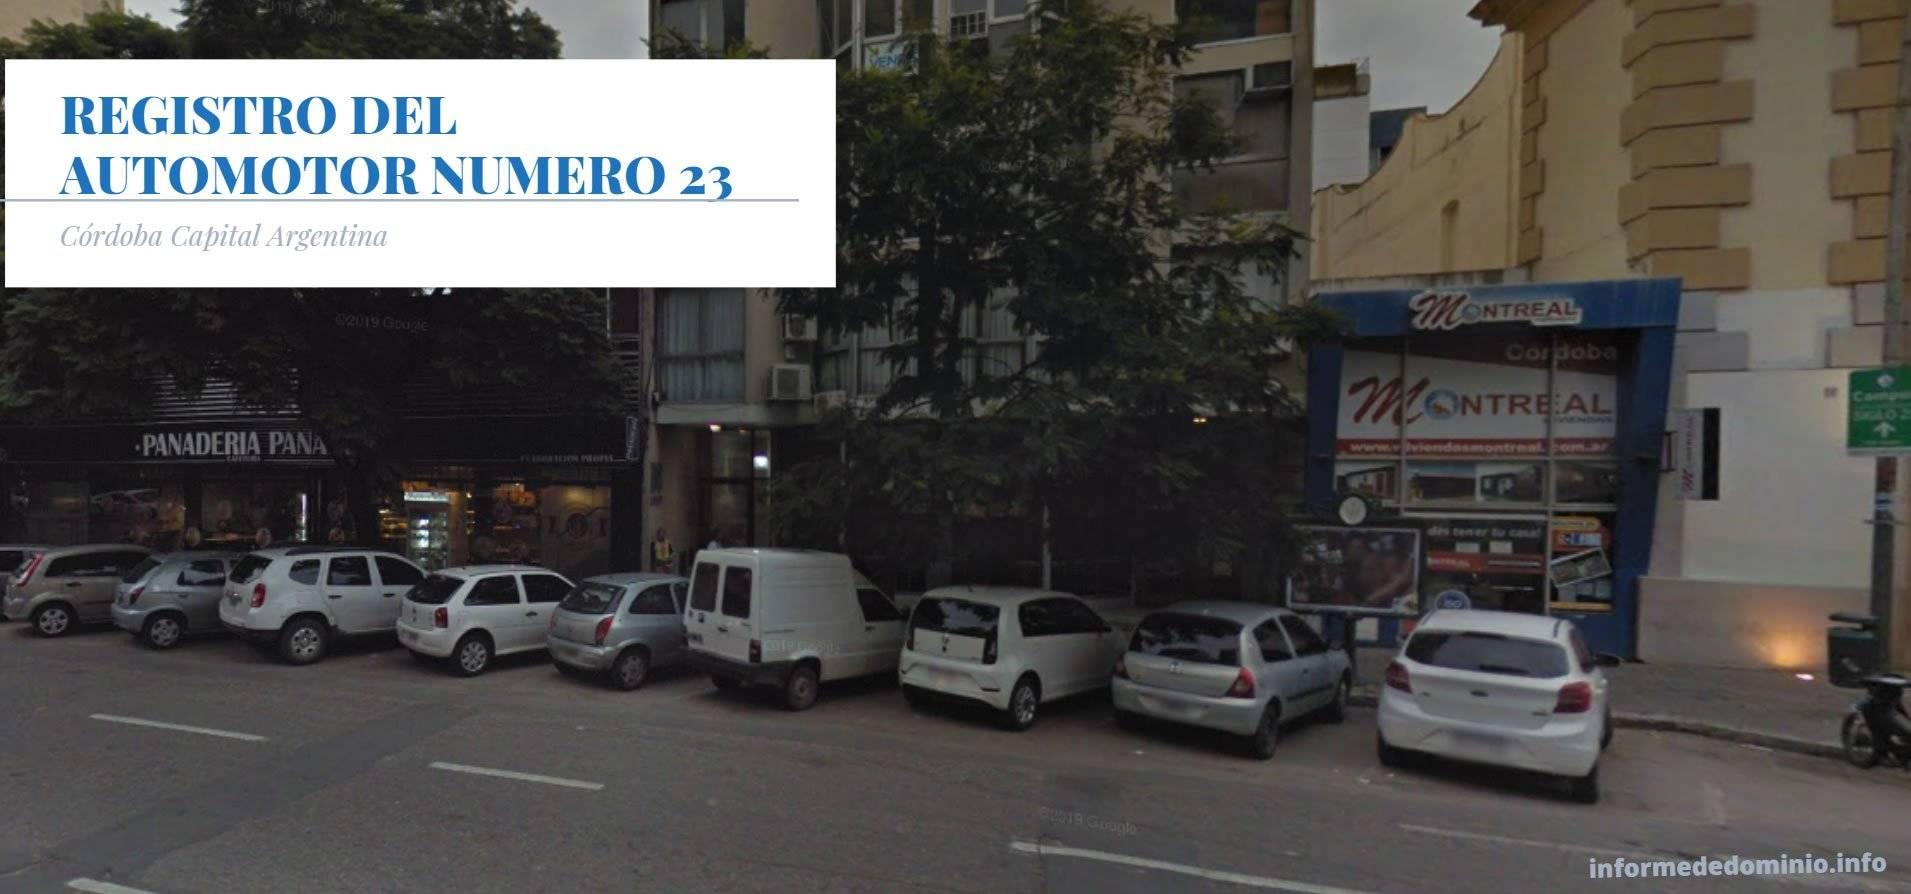 Registro Automotor Número 23 de Cordoba Capital